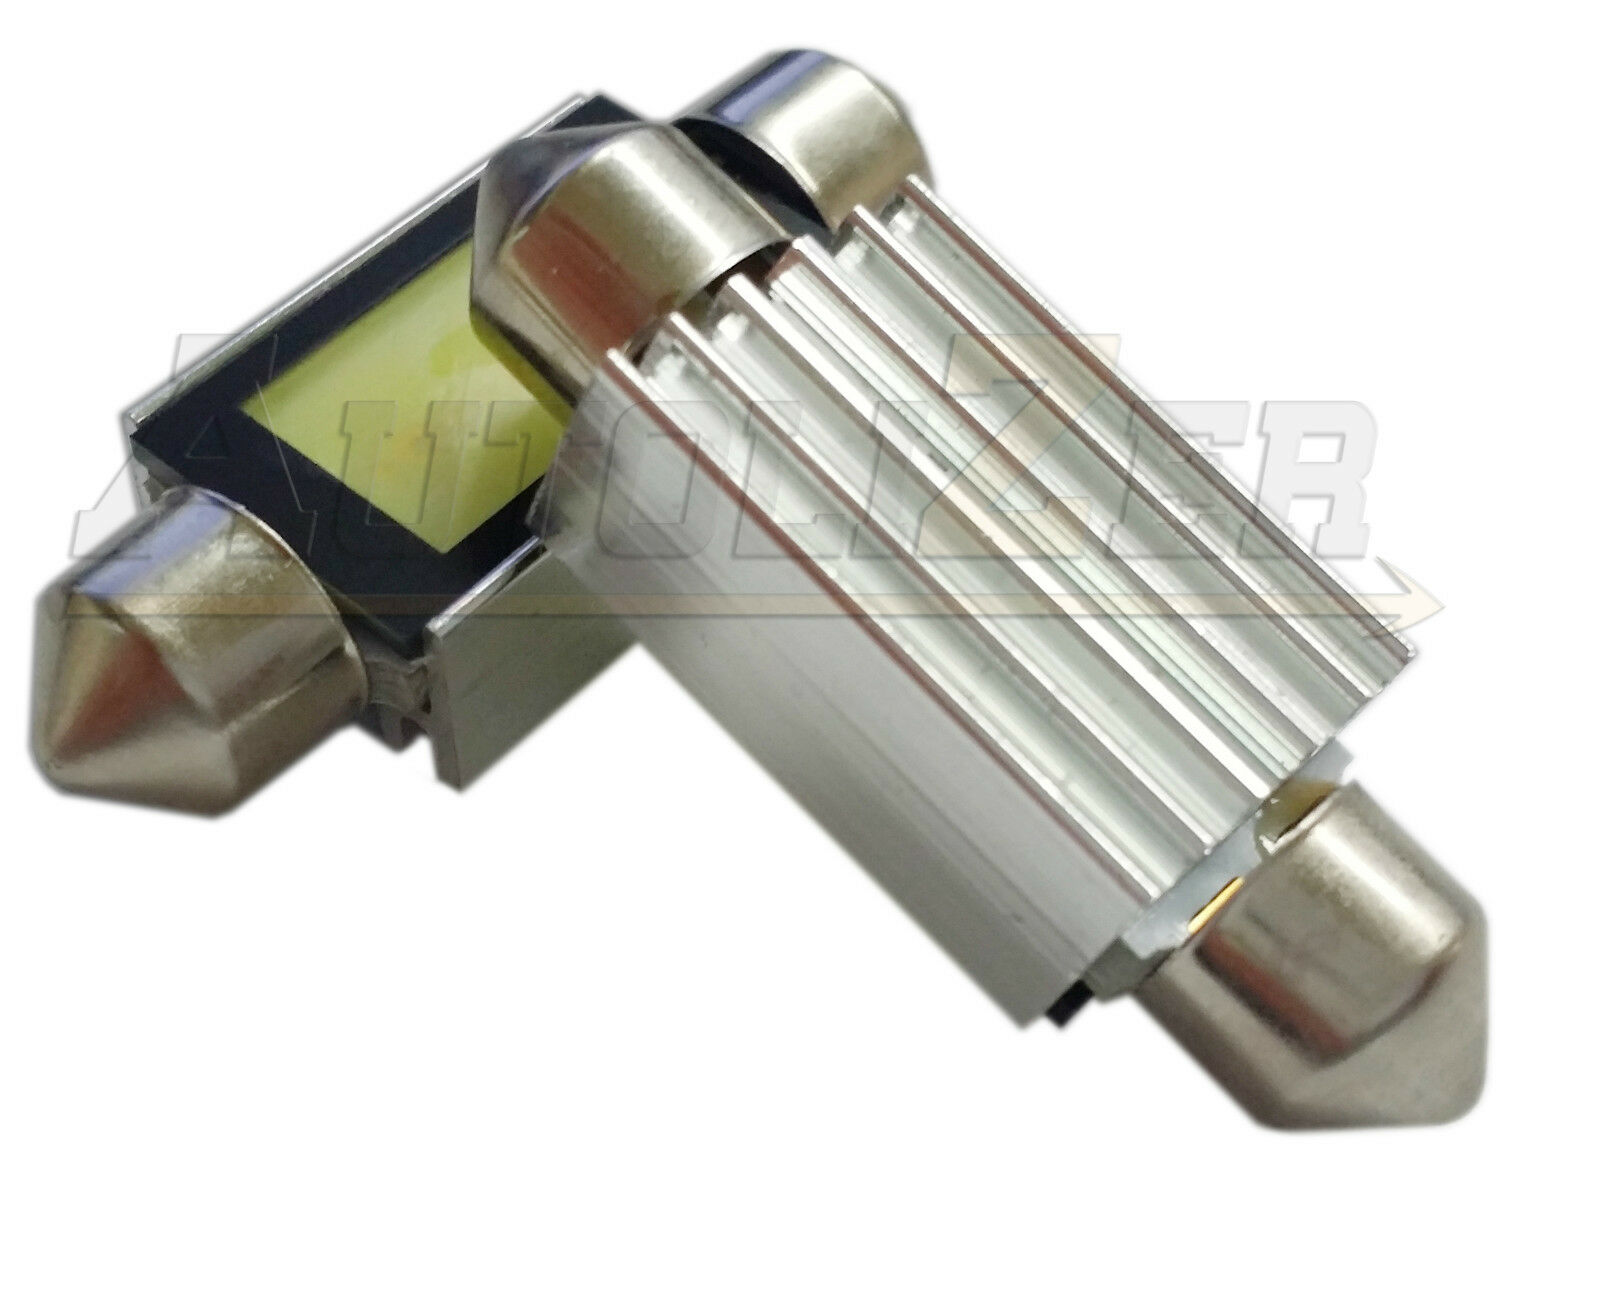 6000K Xenon White COB LED Map/Dome Interior Lights Lamp Bulbs 31MM Festoon 12V eBay